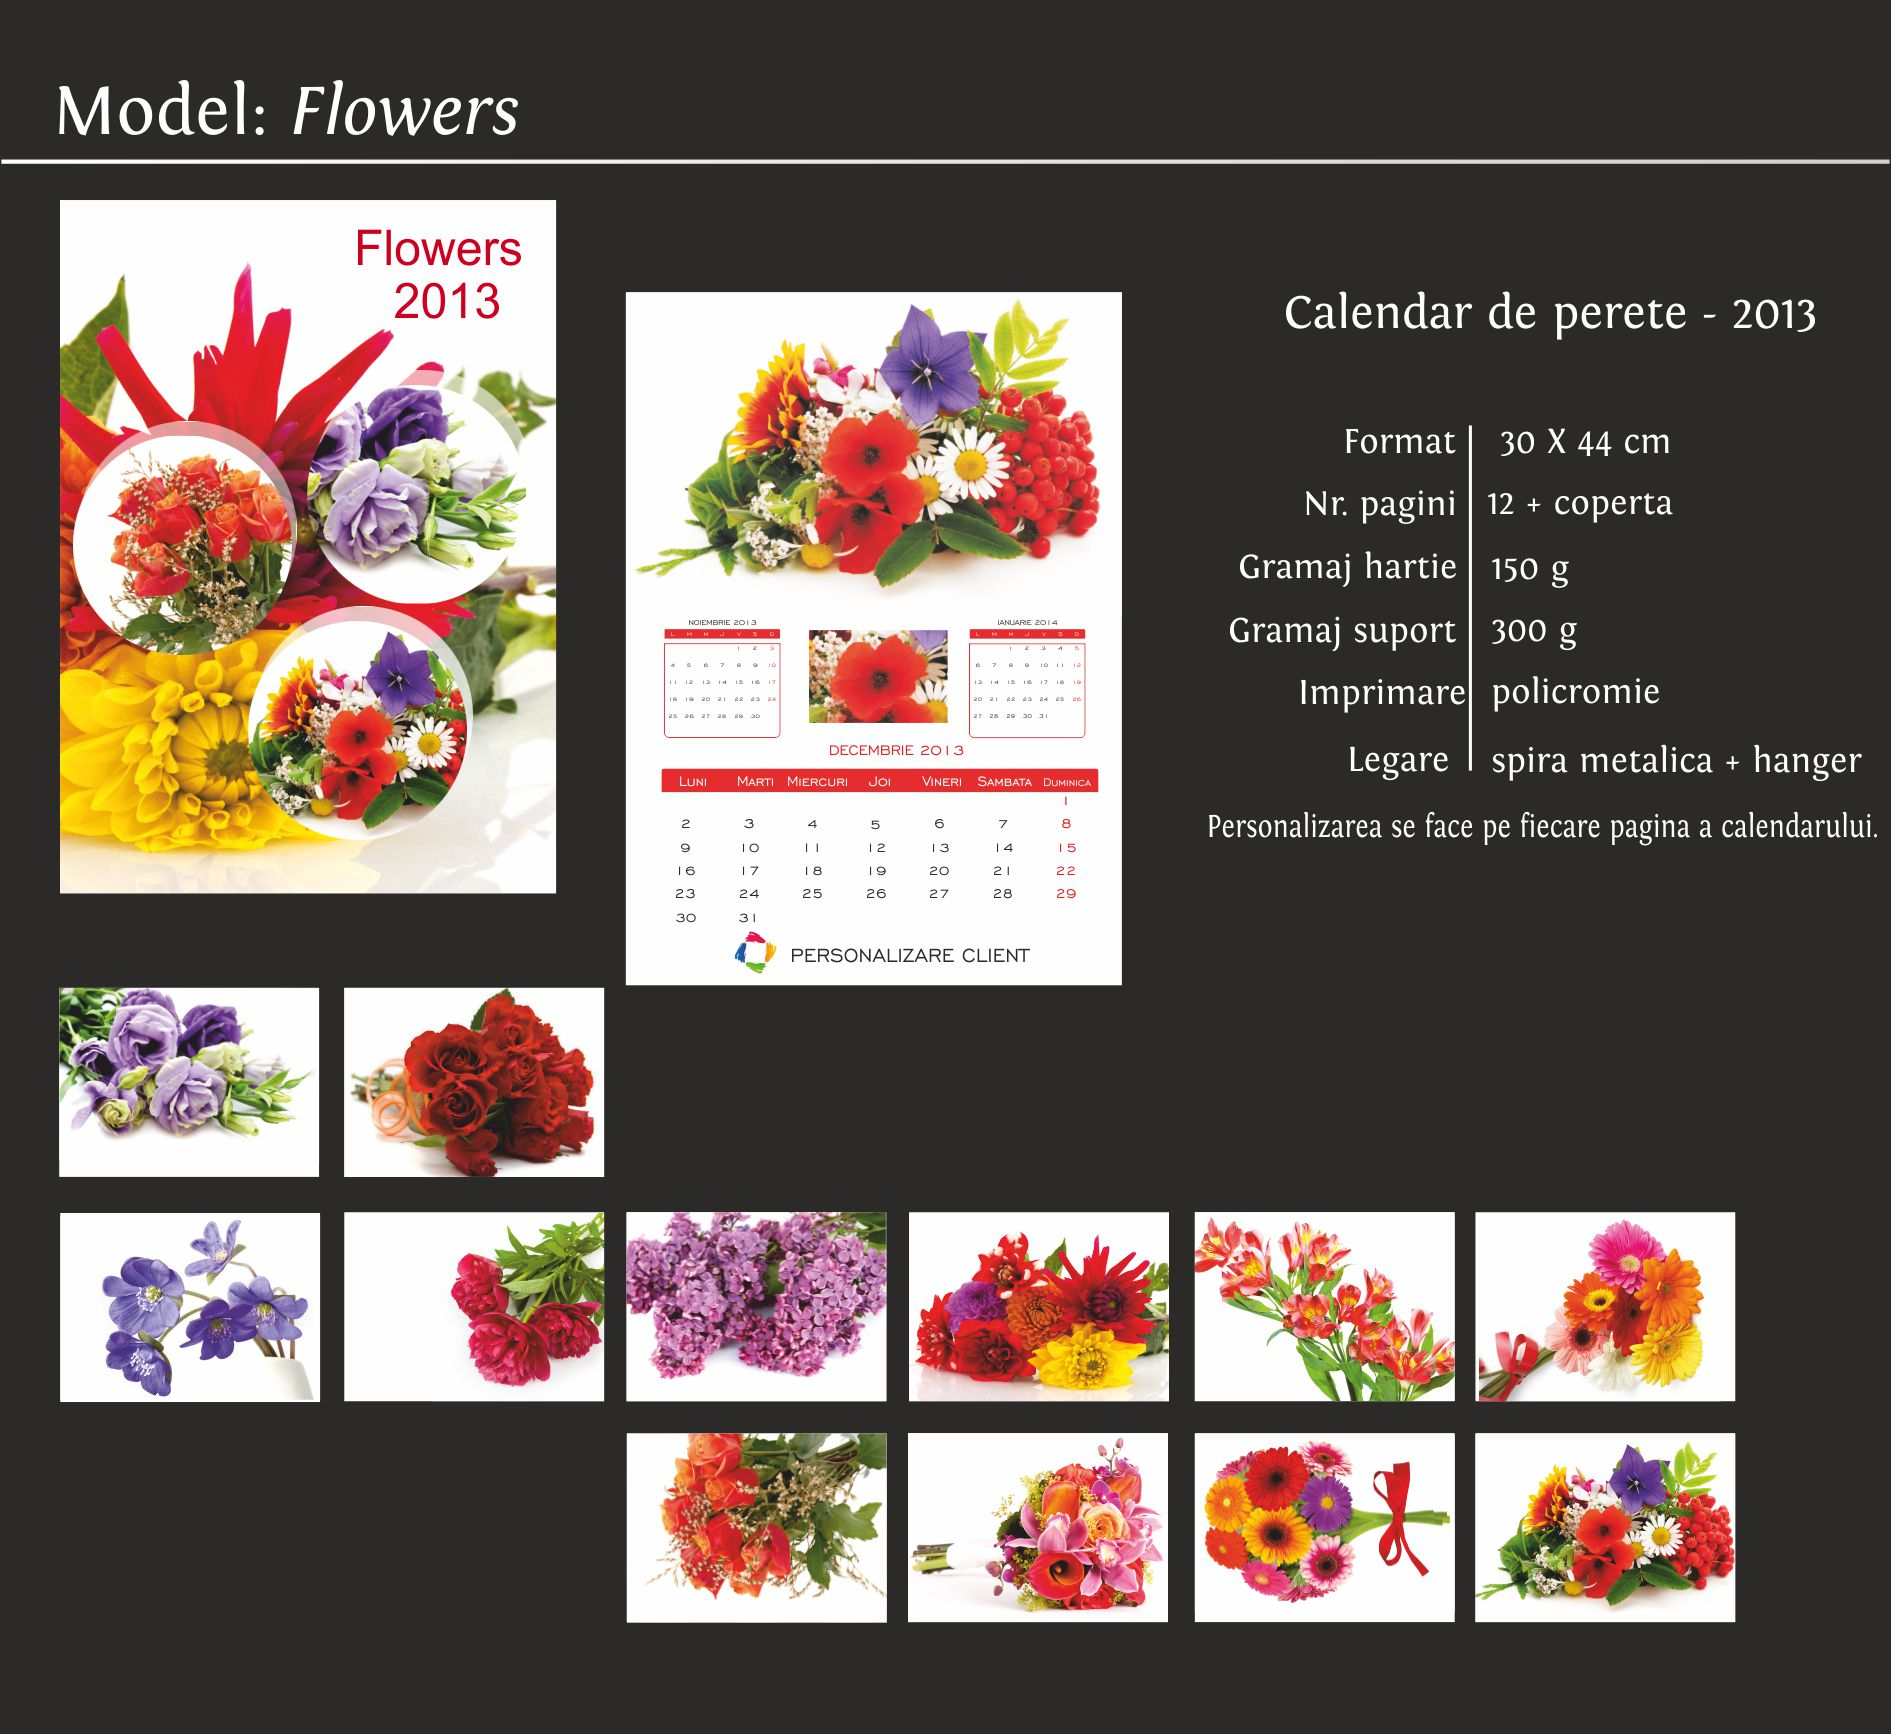 calendare de perete model flowers